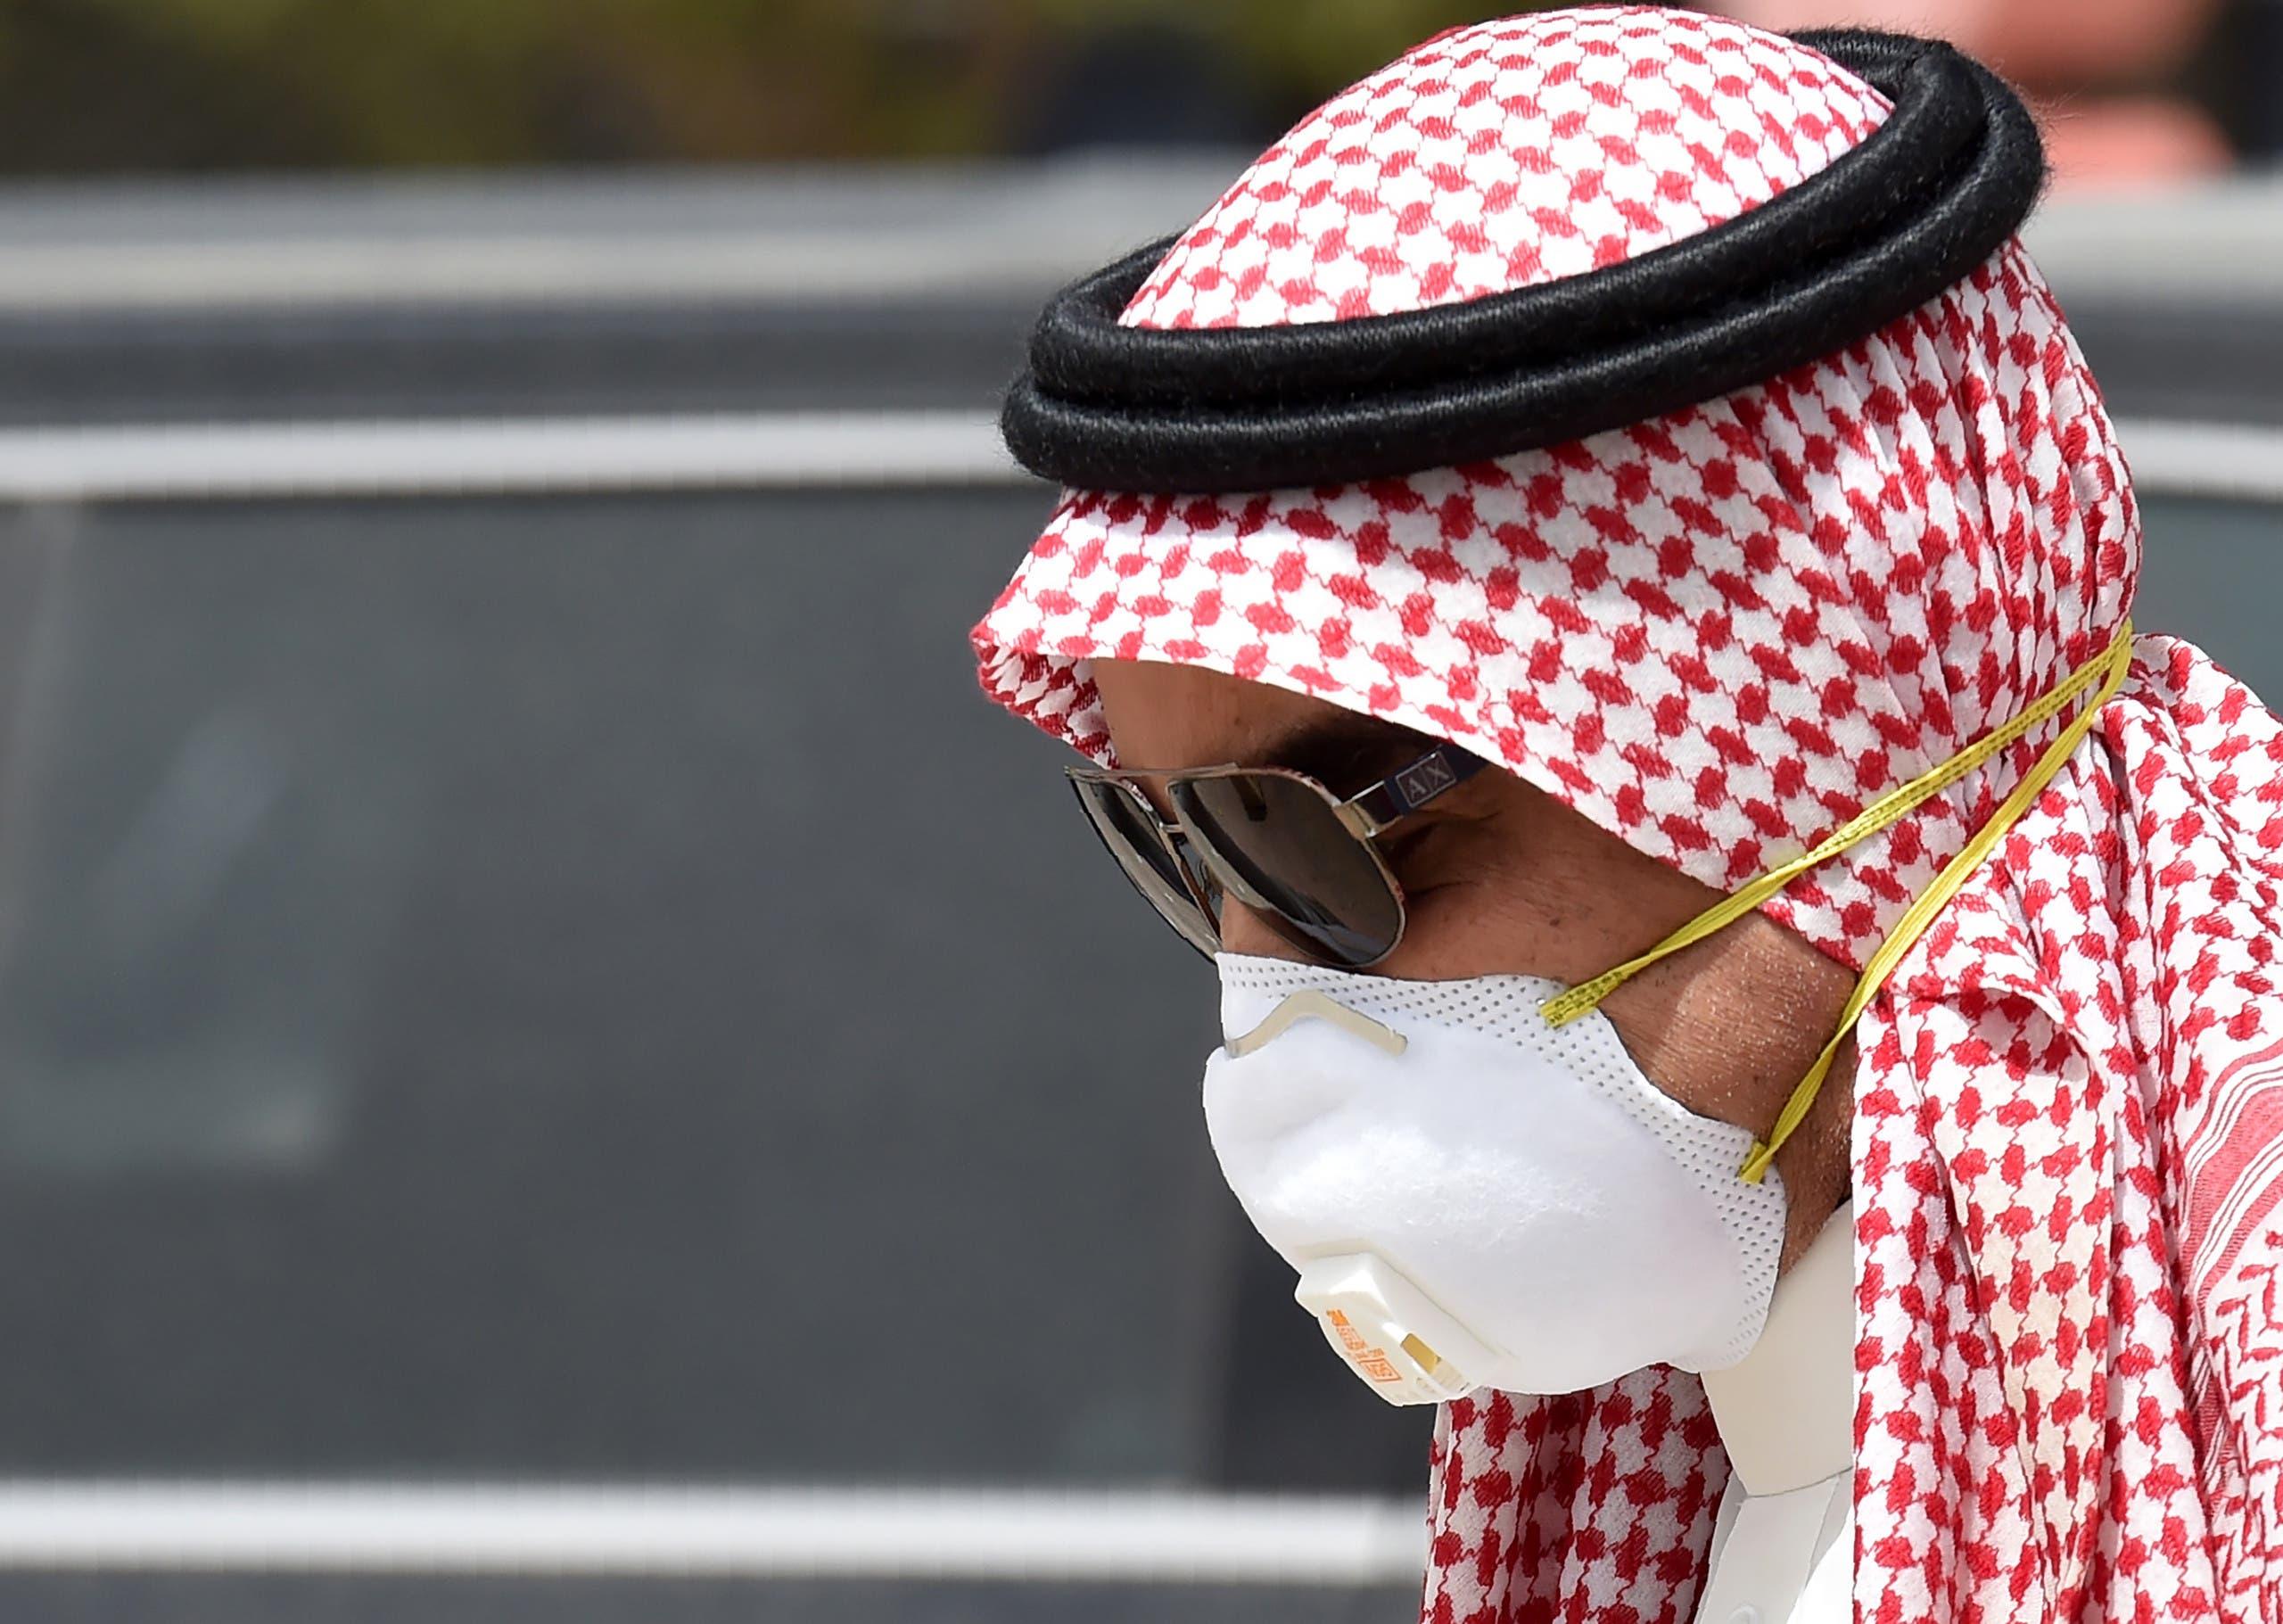 A Saudi man wearing a protective mask as a precaution against COVID-19 coronavirus disease in Riyadh on March 15, 2020. (AFP)